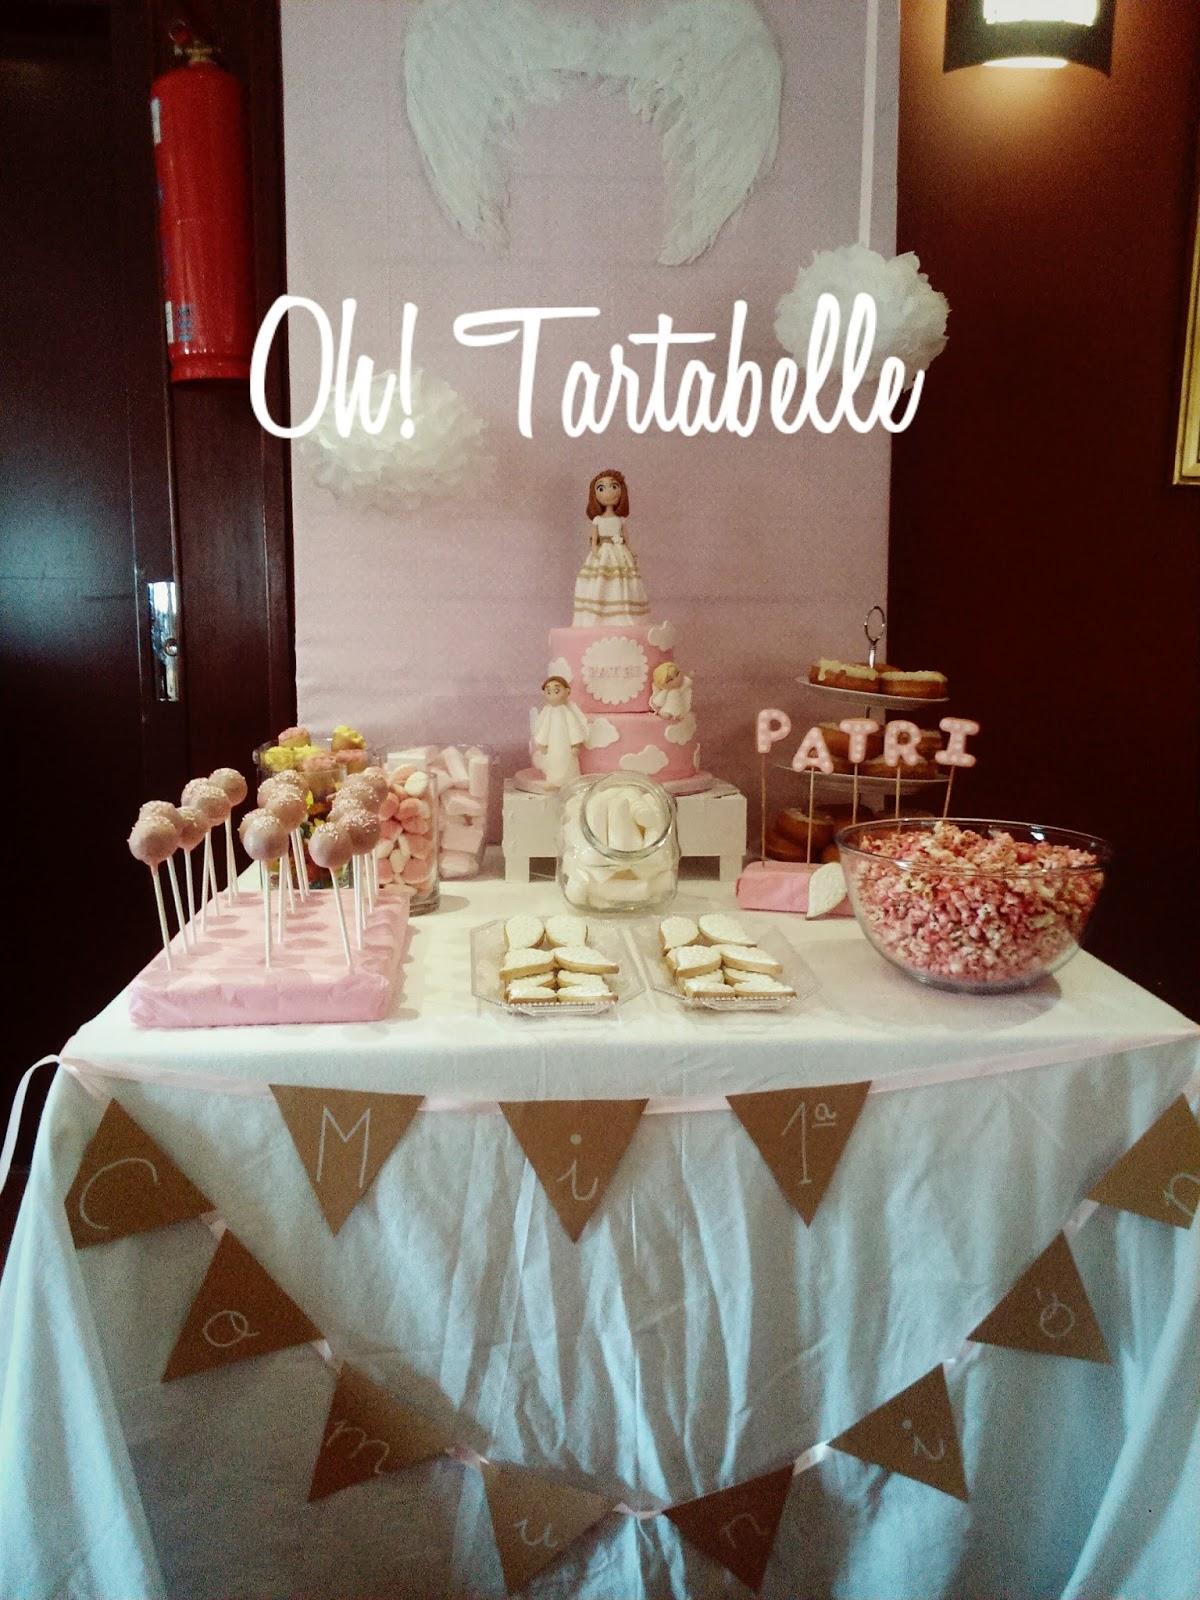 Oh tartabelle mesas dulces y tartas para comuniones - Adornos mesa comunion ...